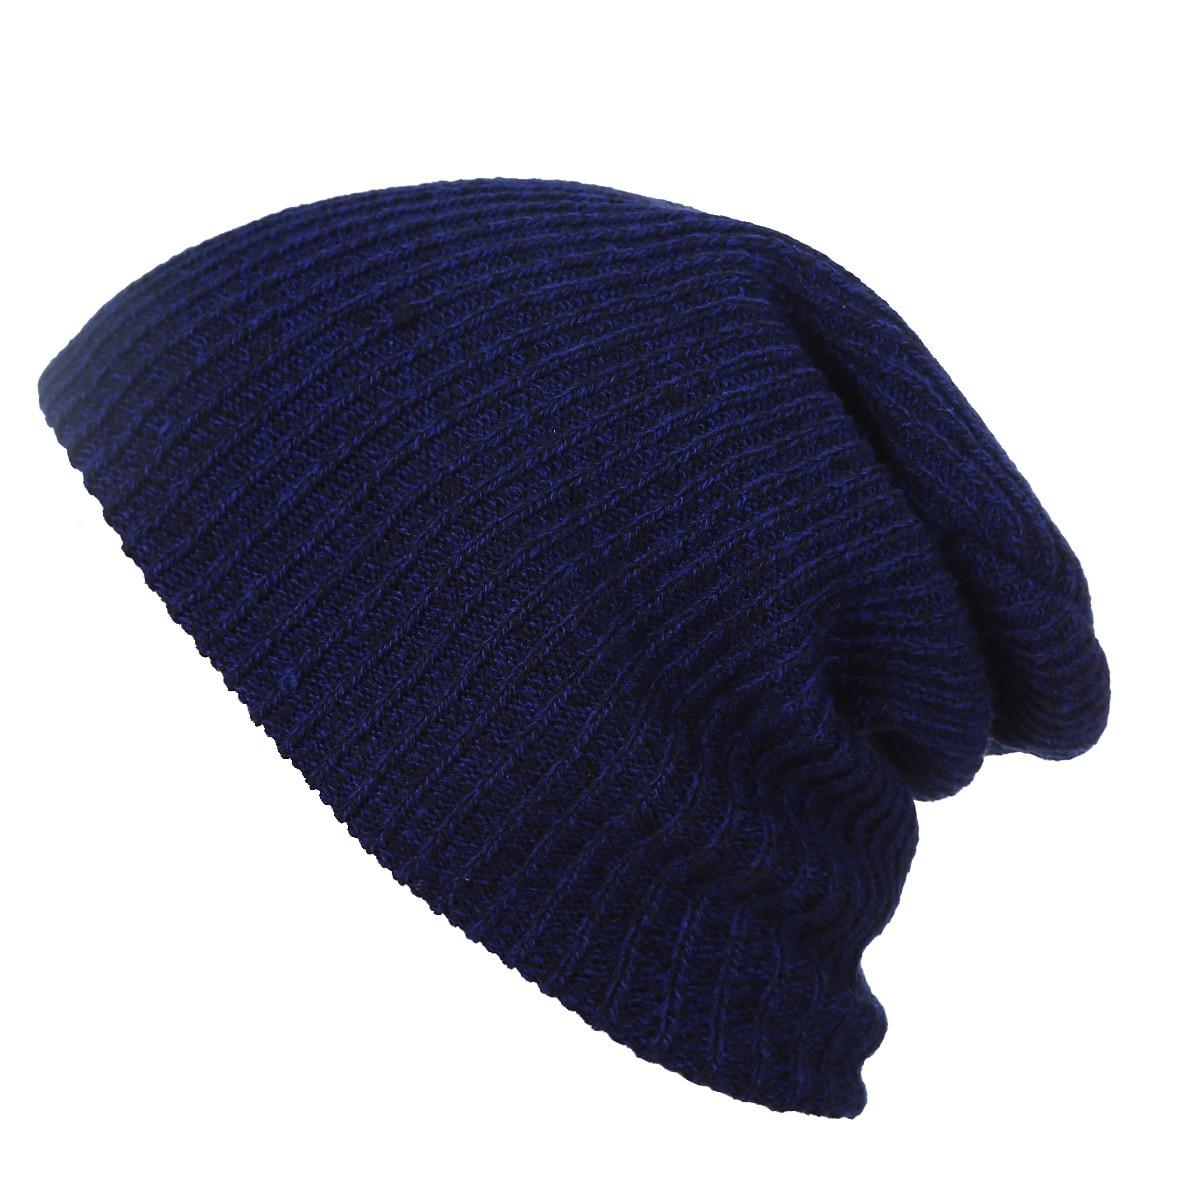 COKK Χειμερινά Καπέλα για Άντρες - Αξεσουάρ ένδυσης - Φωτογραφία 5